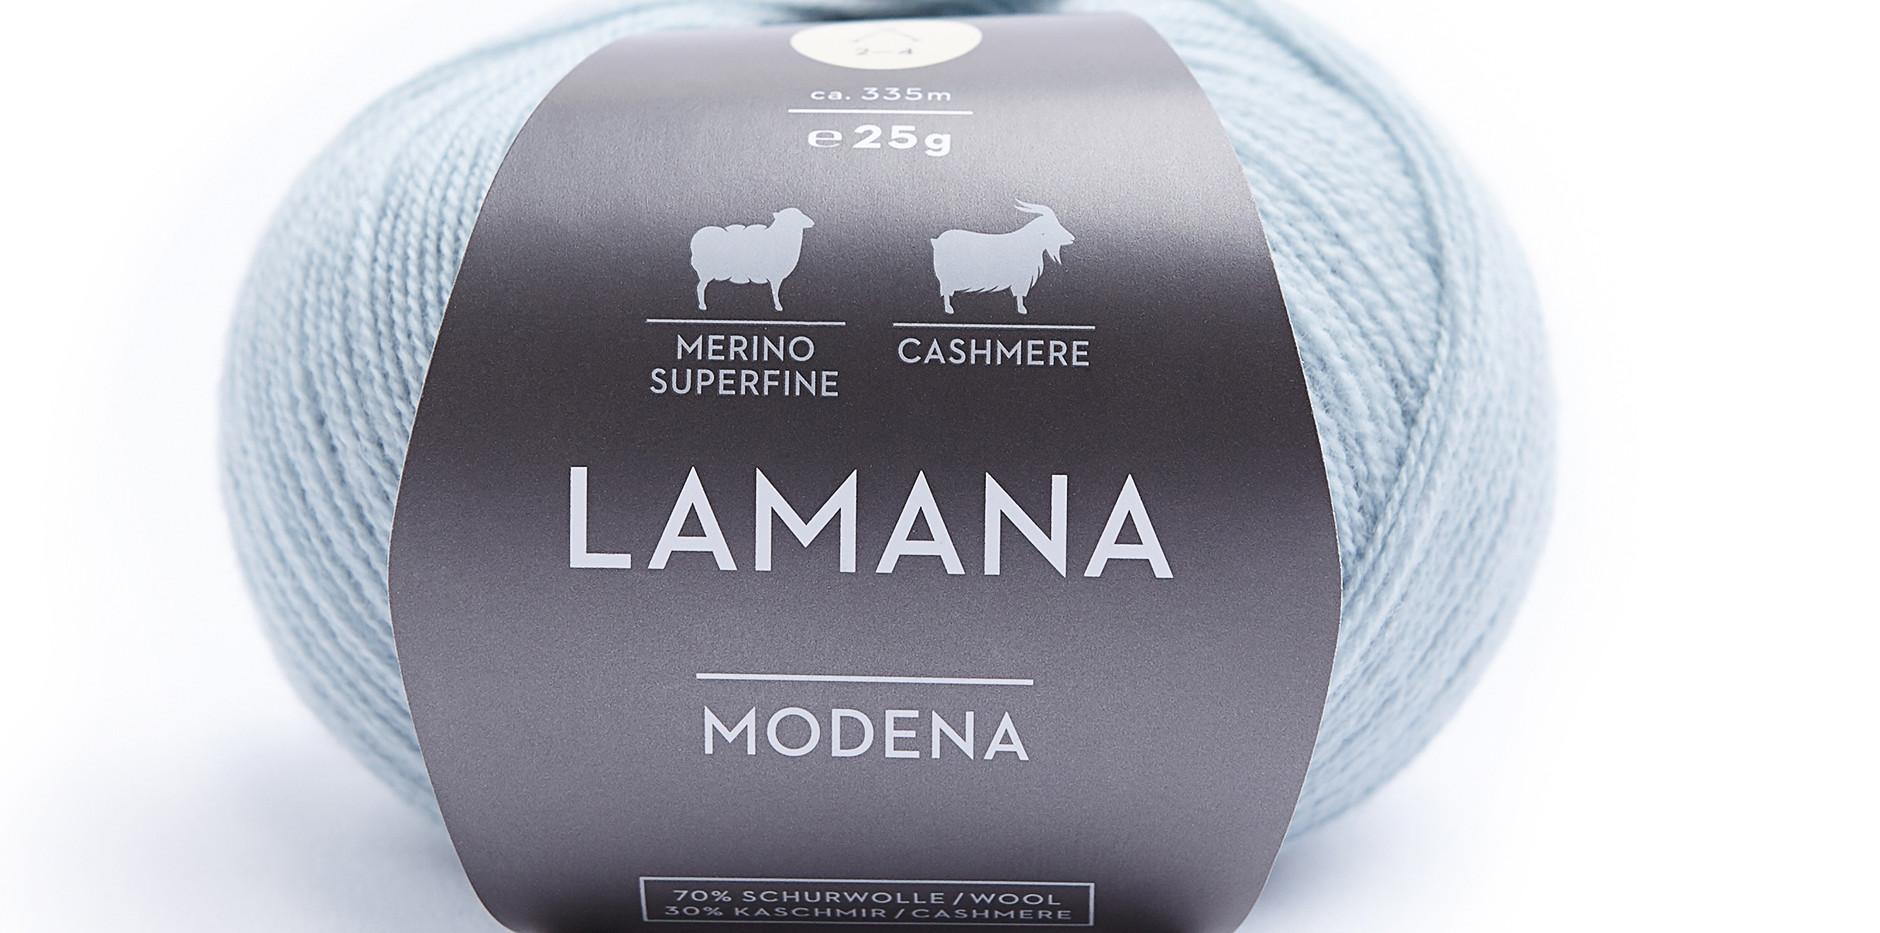 Lamana-Modena